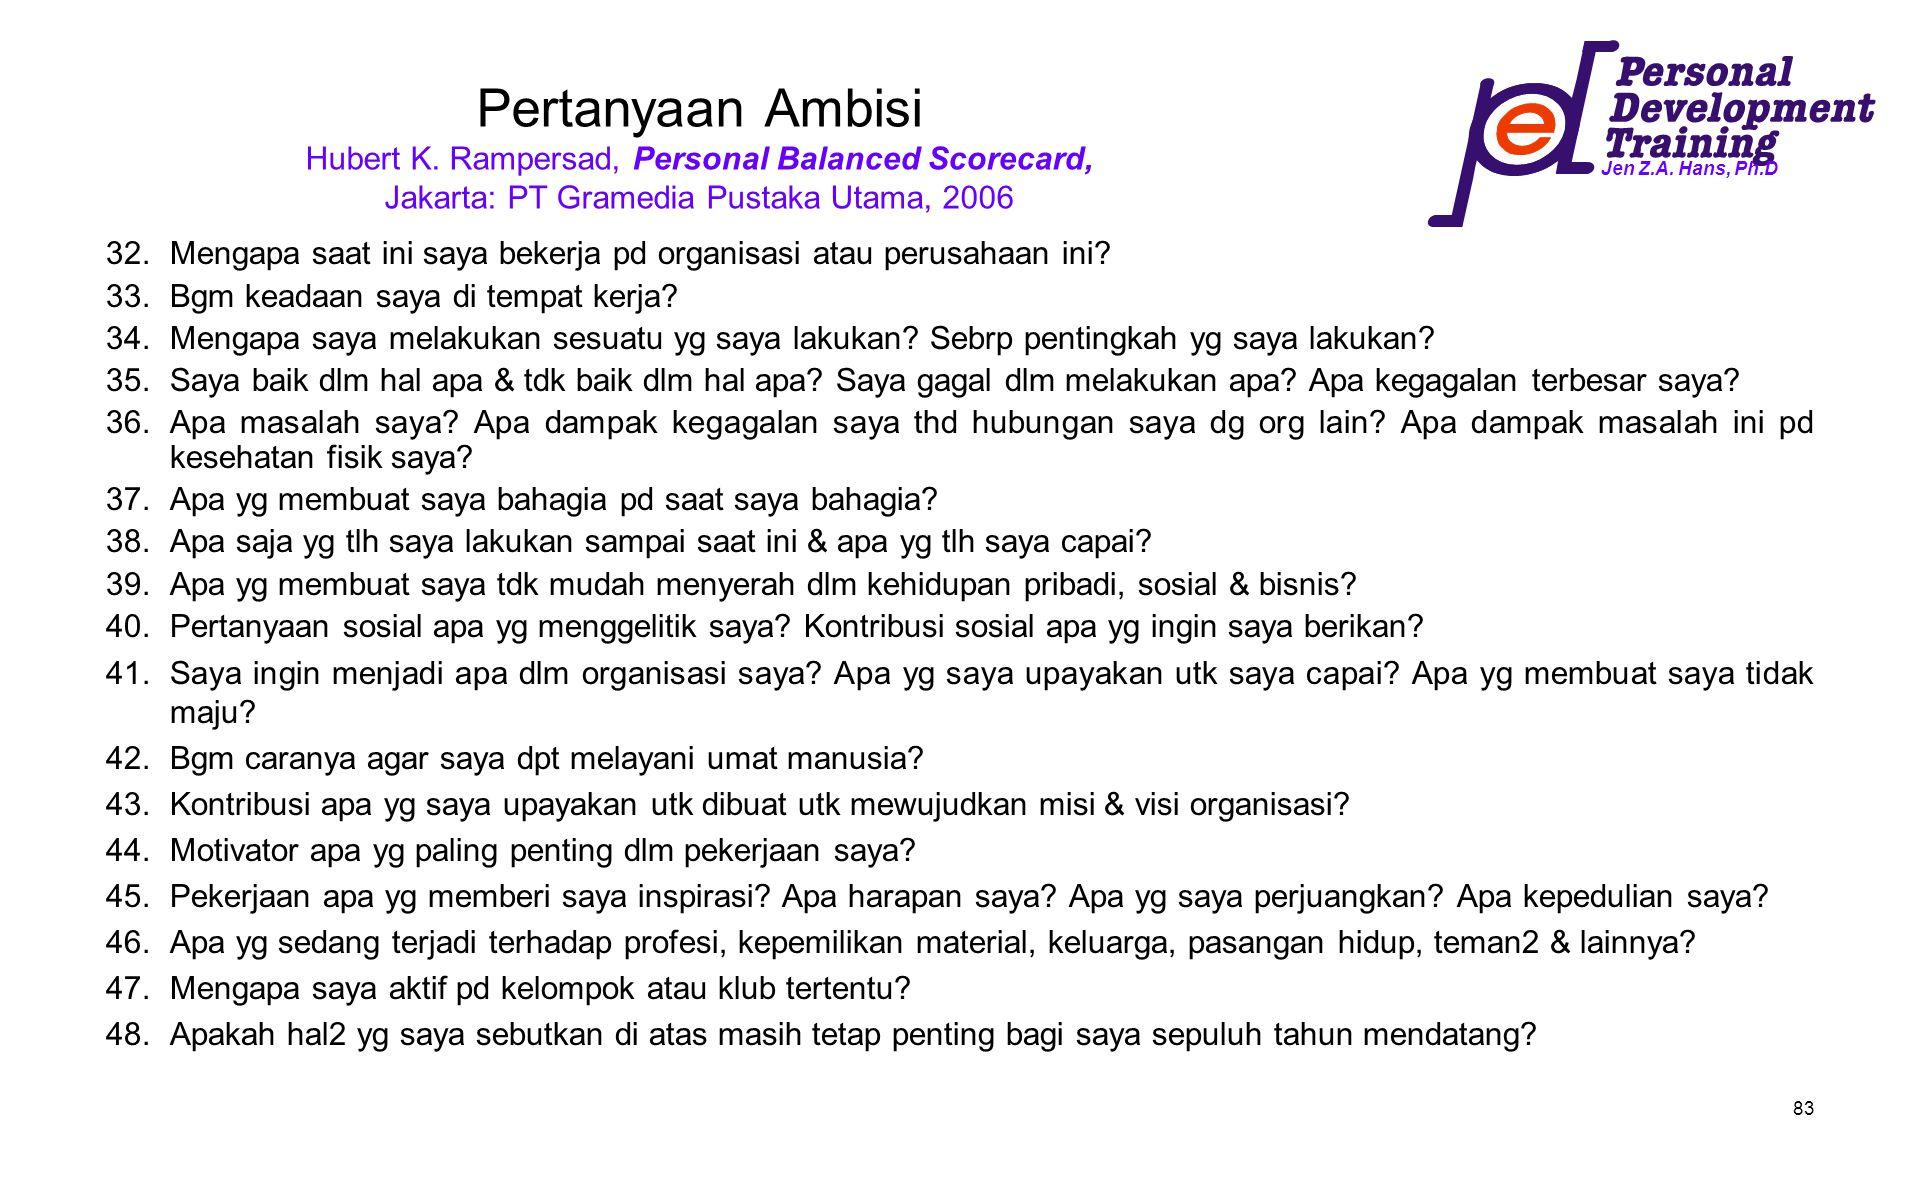 Jen Z.A. Hans, Ph.D 83 Pertanyaan Ambisi Hubert K. Rampersad, Personal Balanced Scorecard, Jakarta: PT Gramedia Pustaka Utama, 2006 32.Mengapa saat in